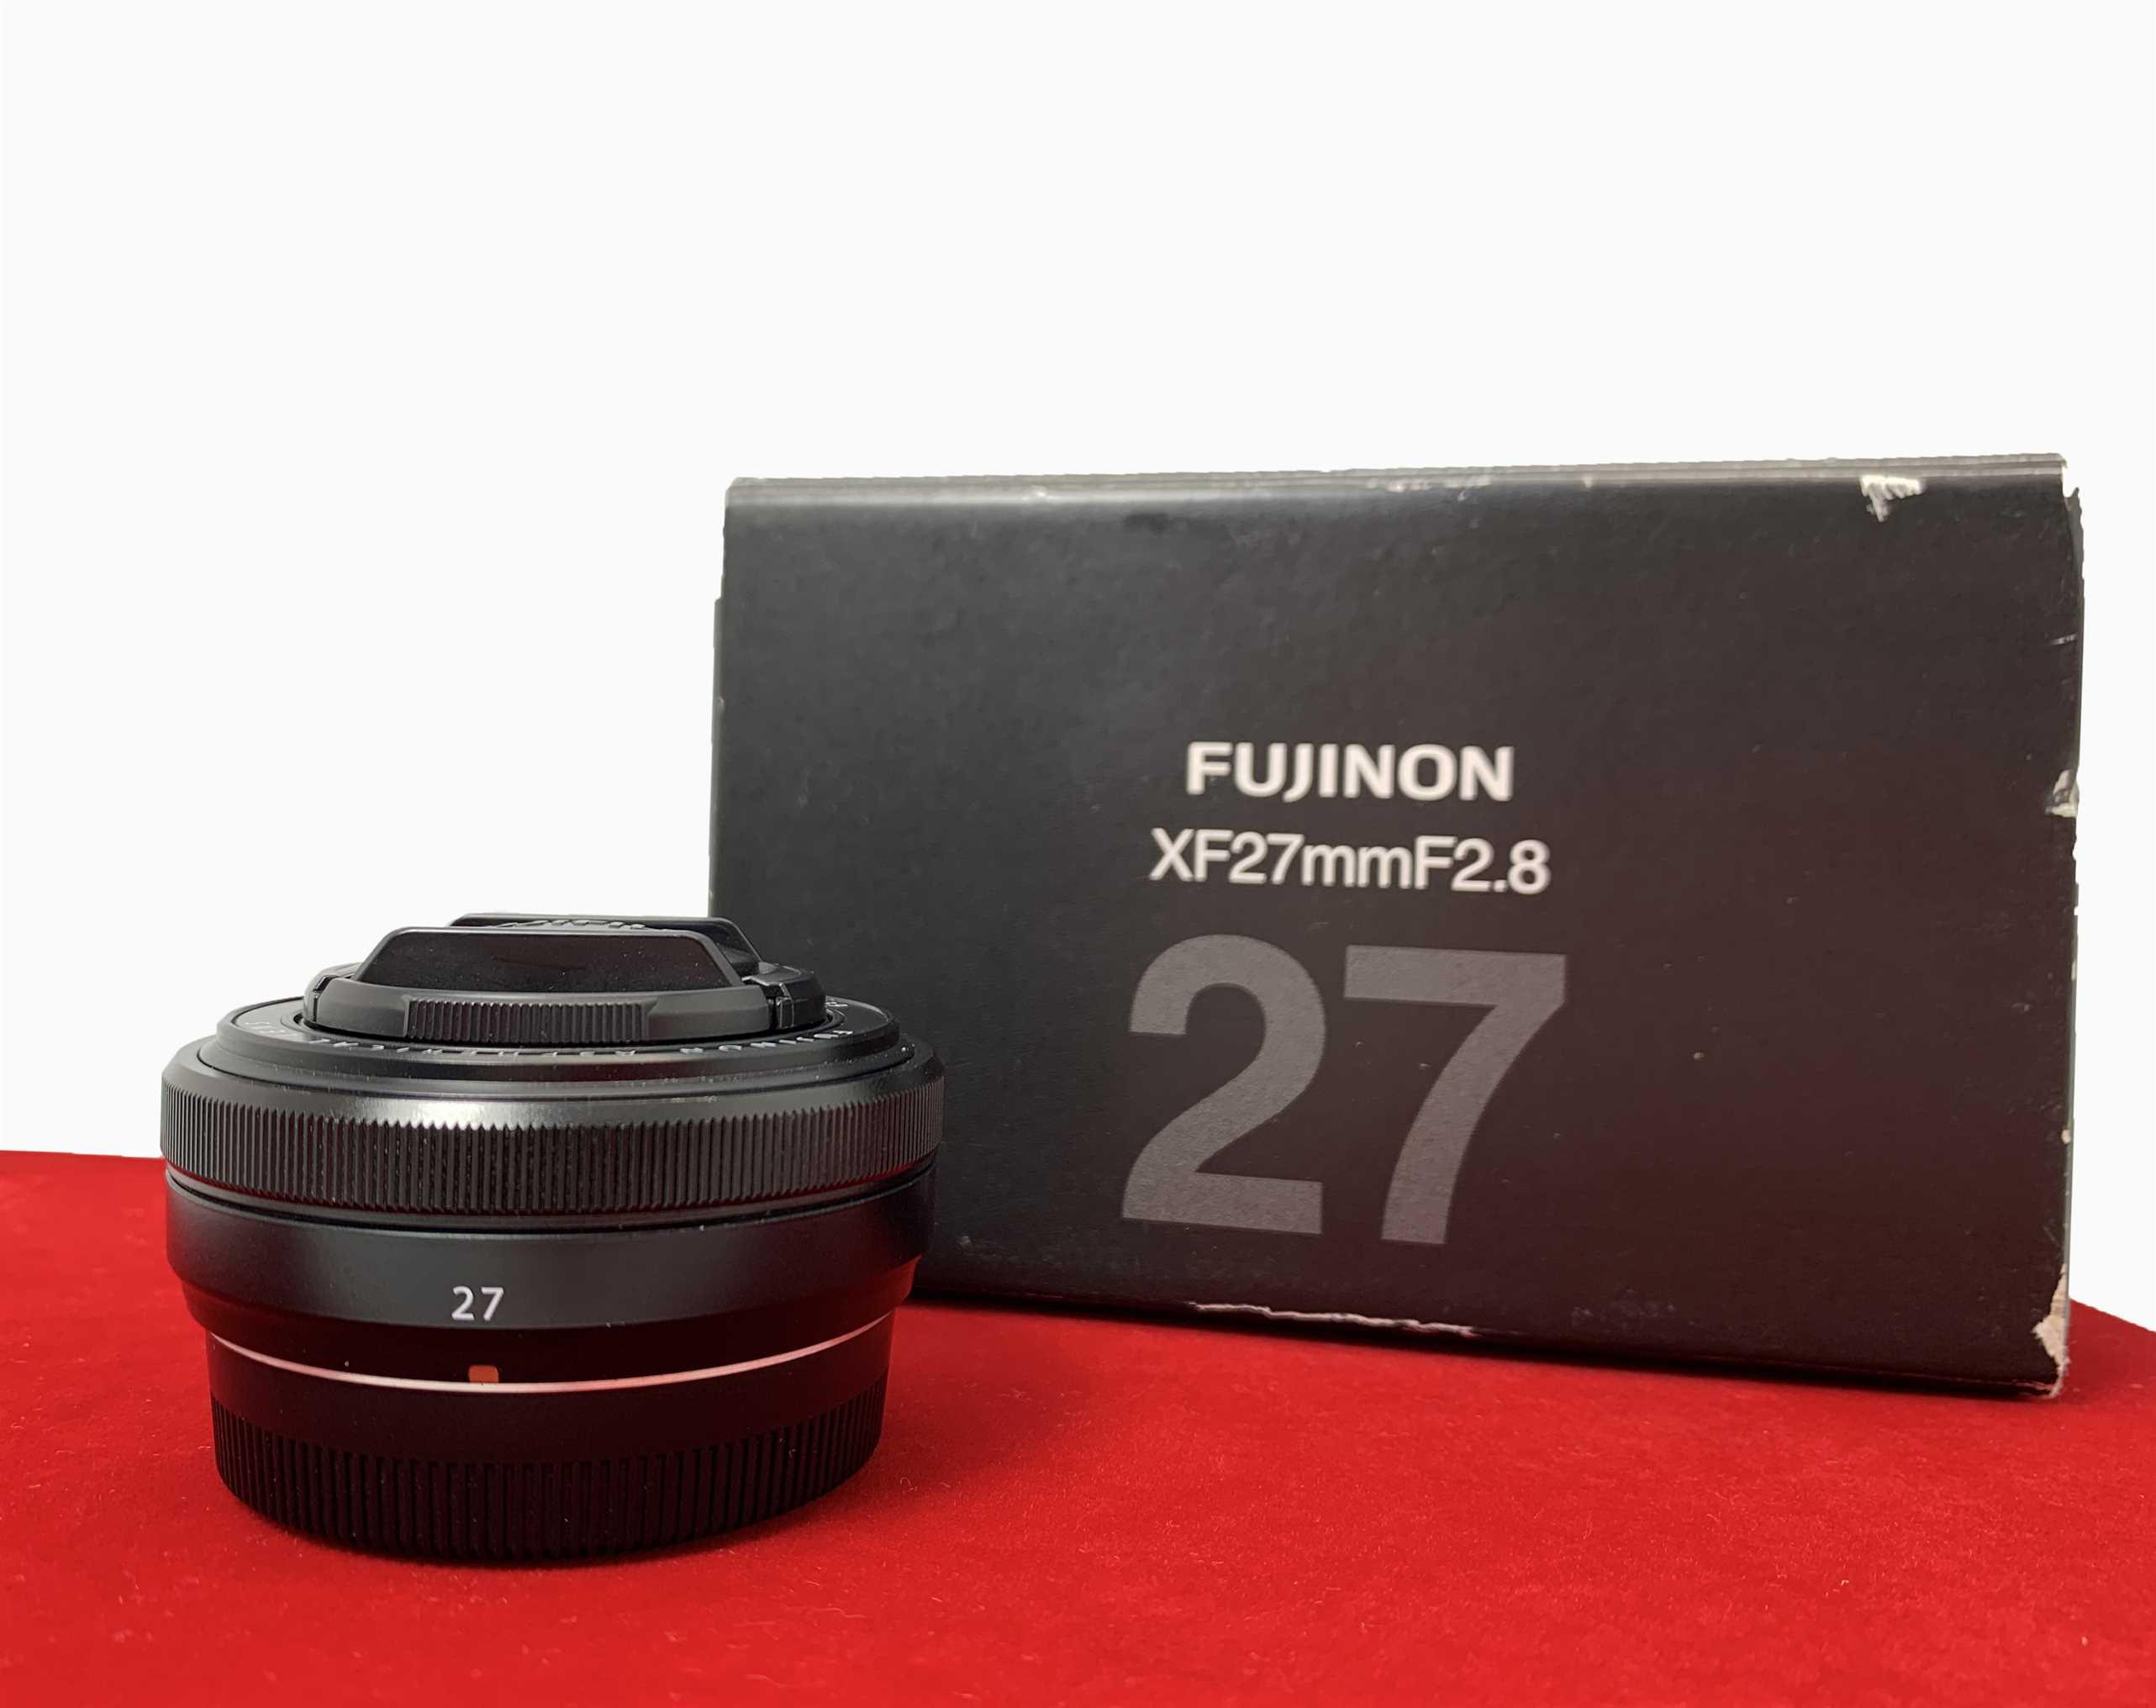 [USED-PJ33] Fujifilm 27MM F2.8 XF Lens, 90% Like New Condition (SN 33A25434)